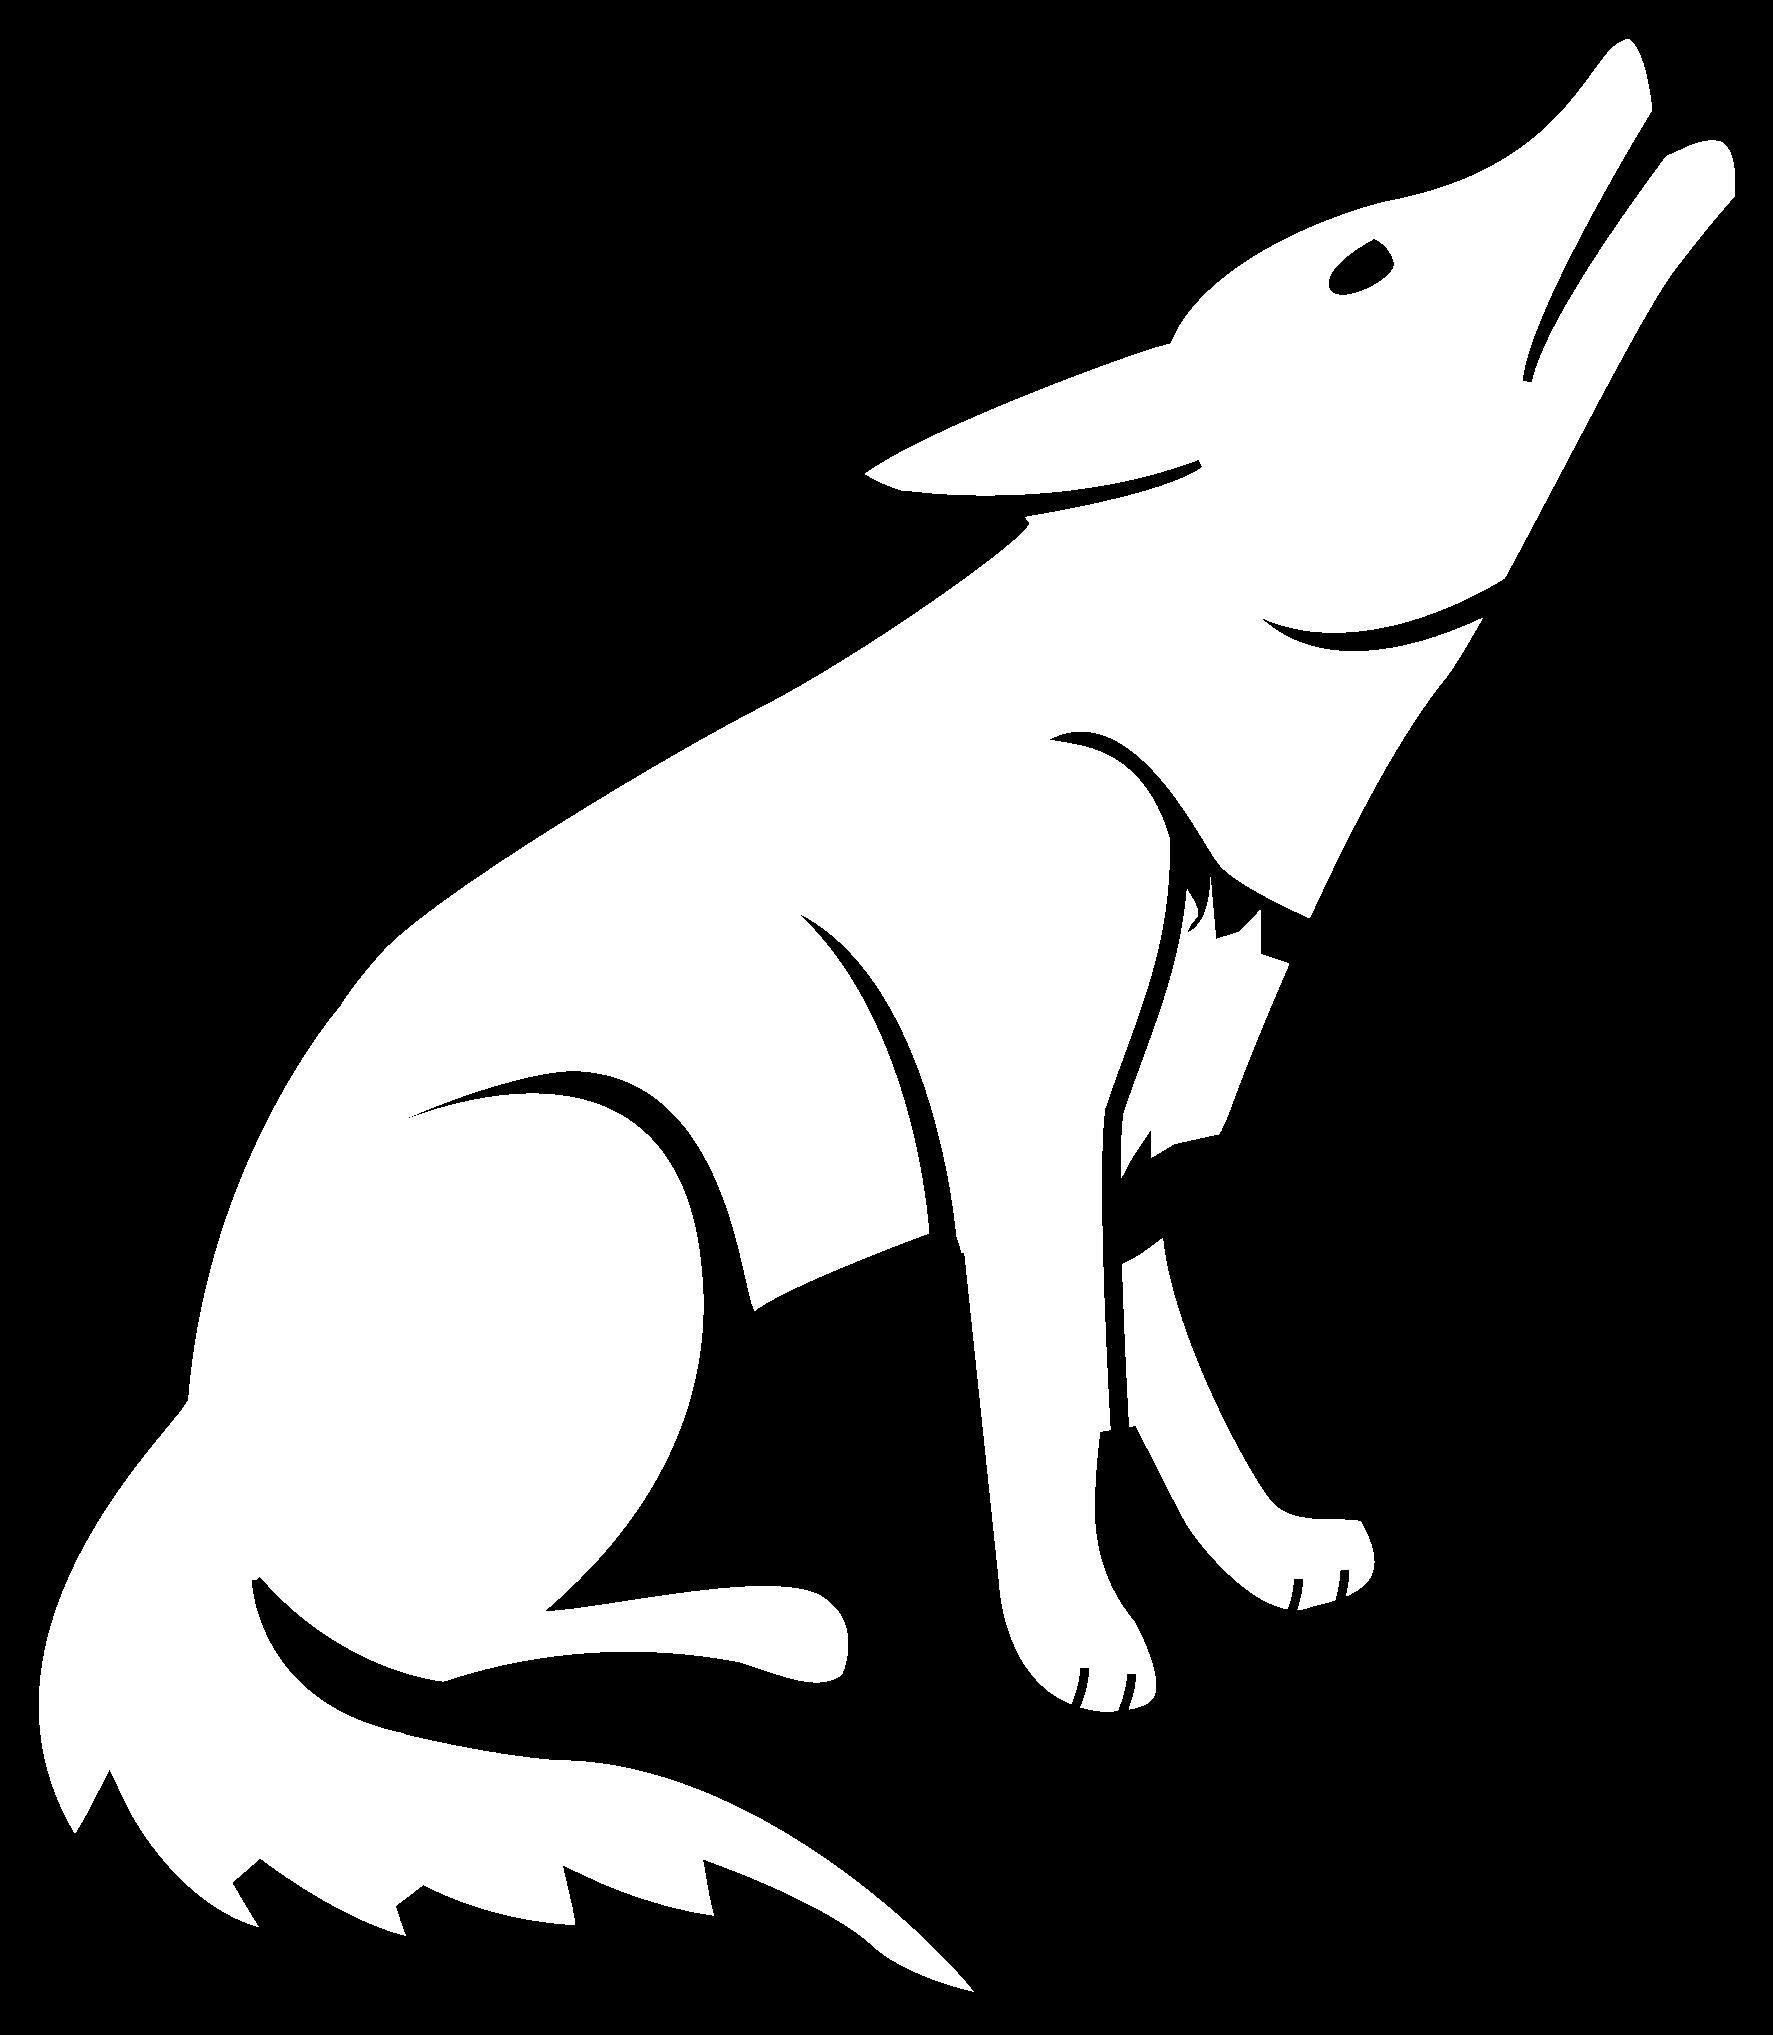 Coyote Linux Logo Png Transparent.